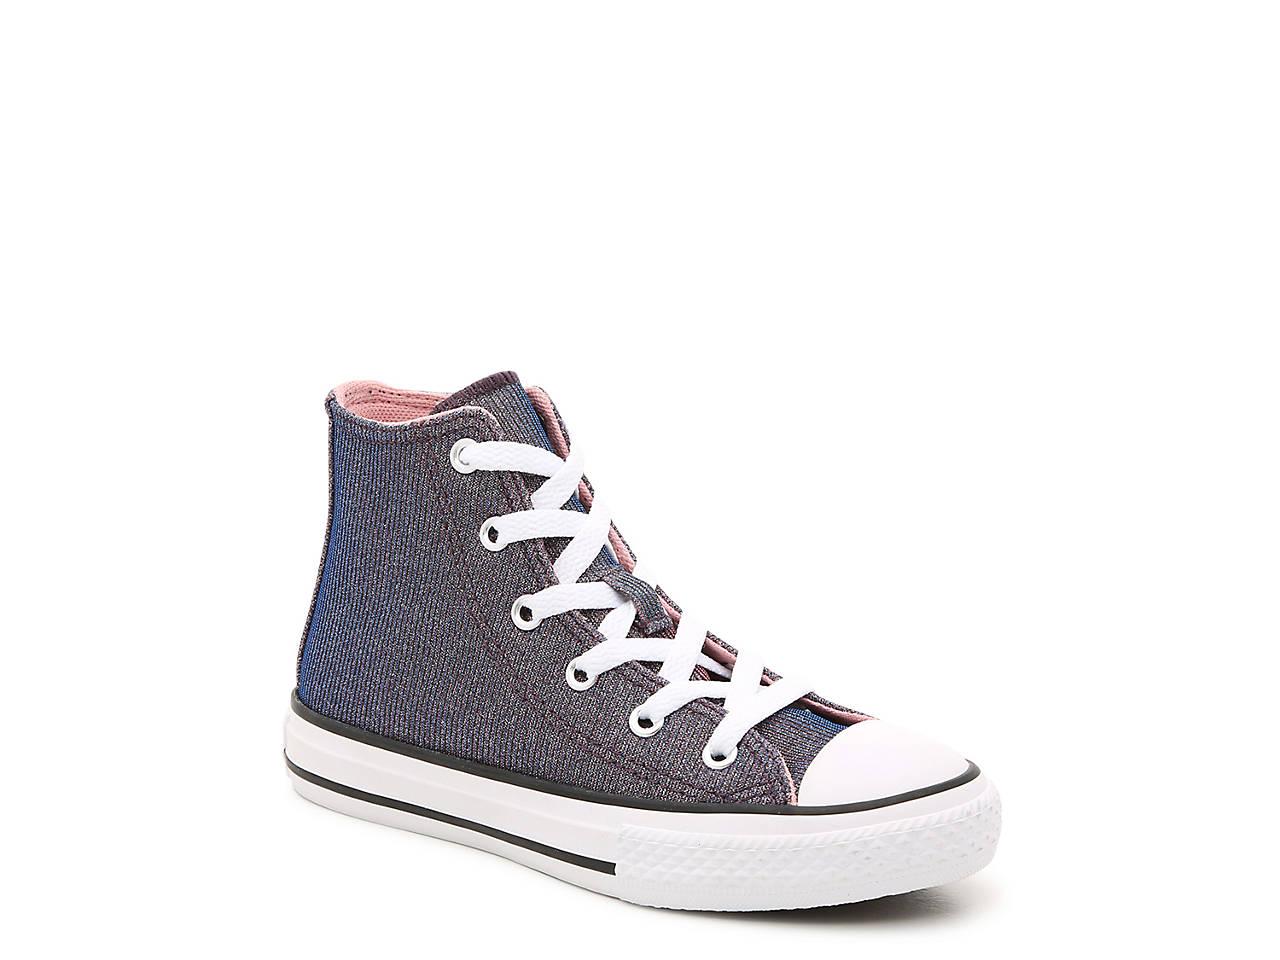 Converse Chuck Taylor All Star Space Star High Top Sneaker